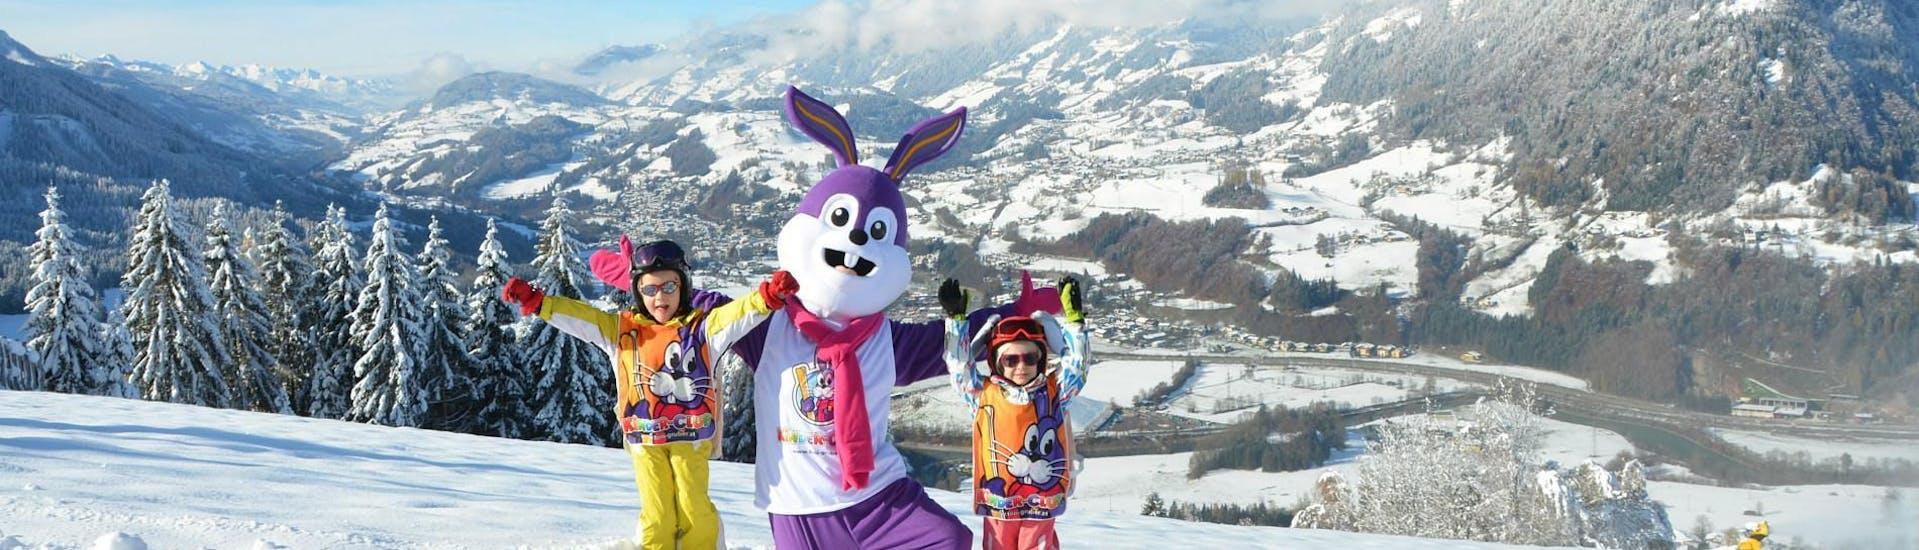 Curso de esquí para niños para principiantes